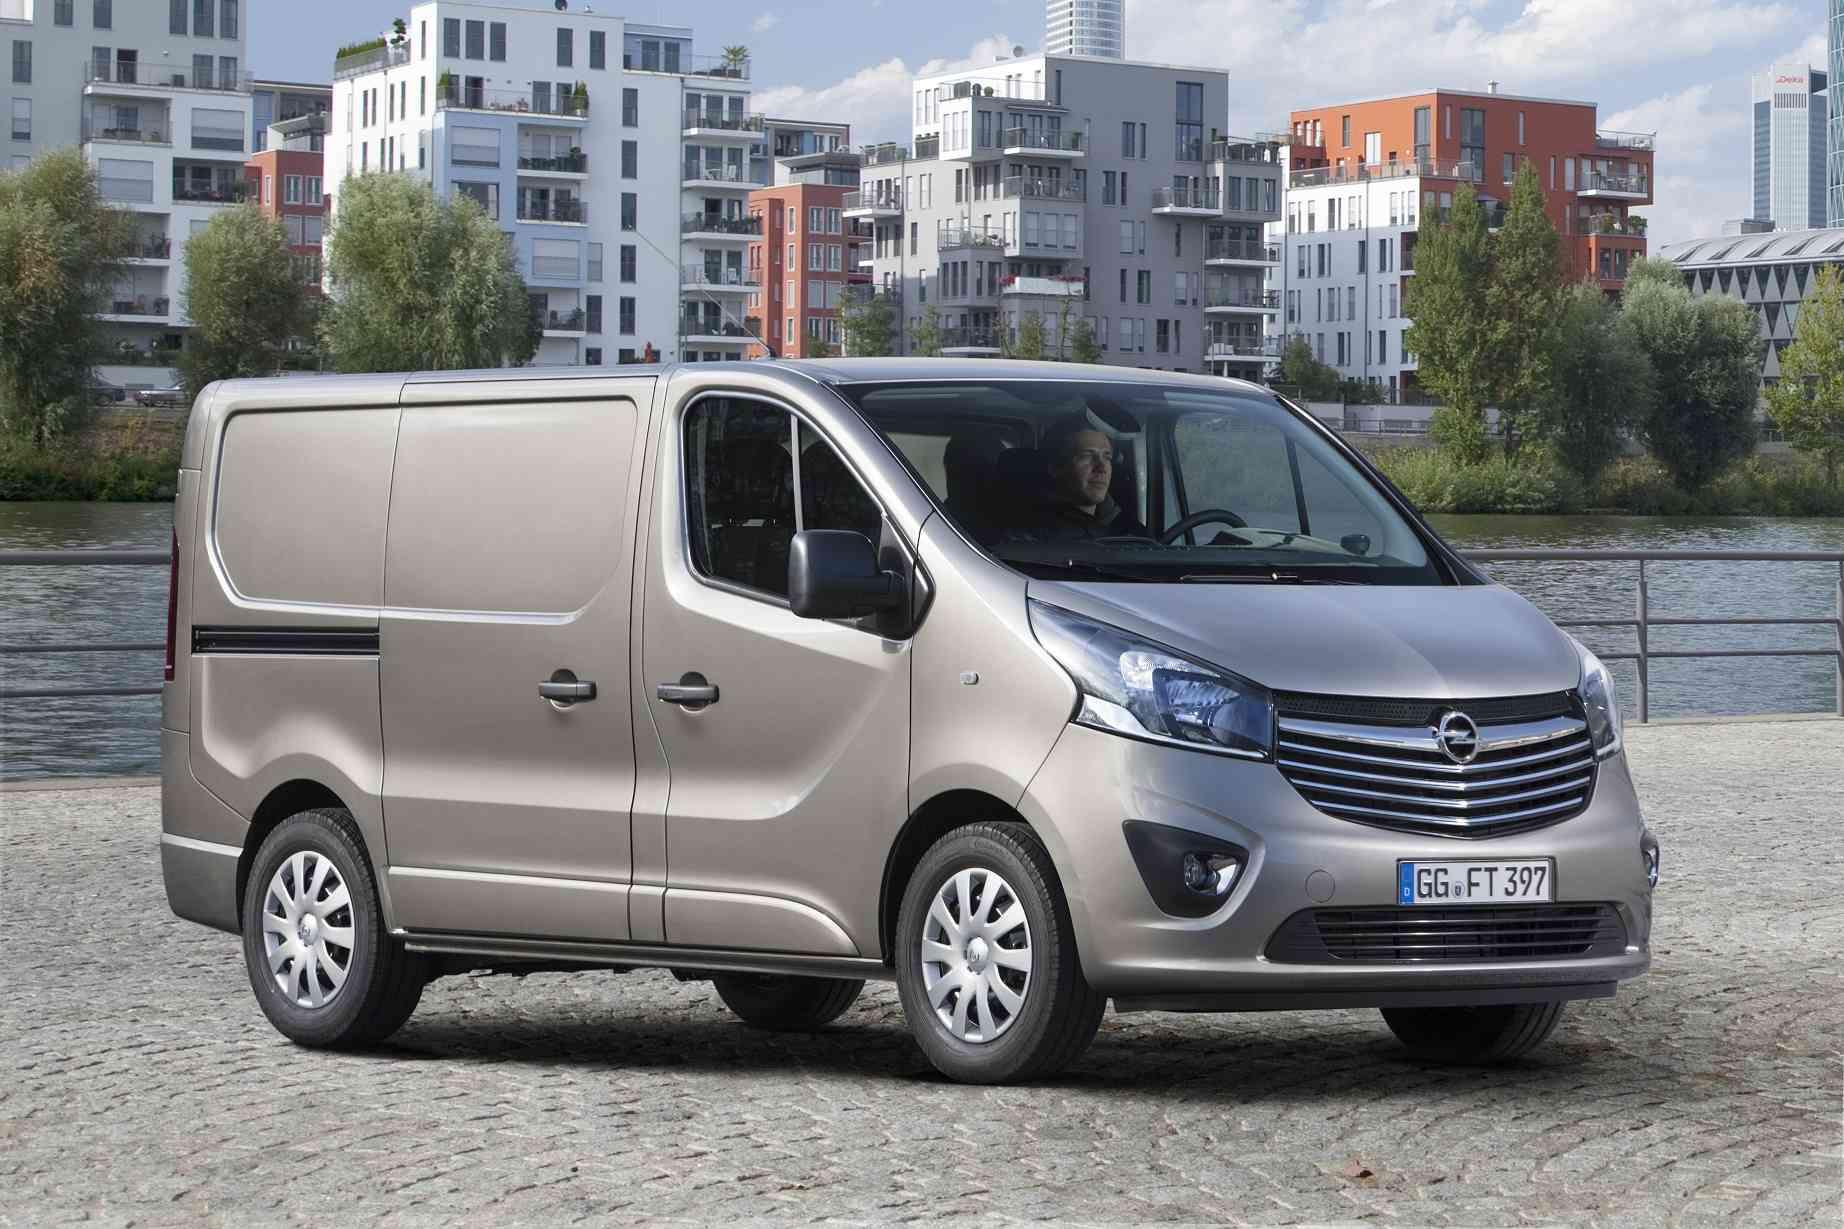 Opel Vivaro Embargo 18.3.14